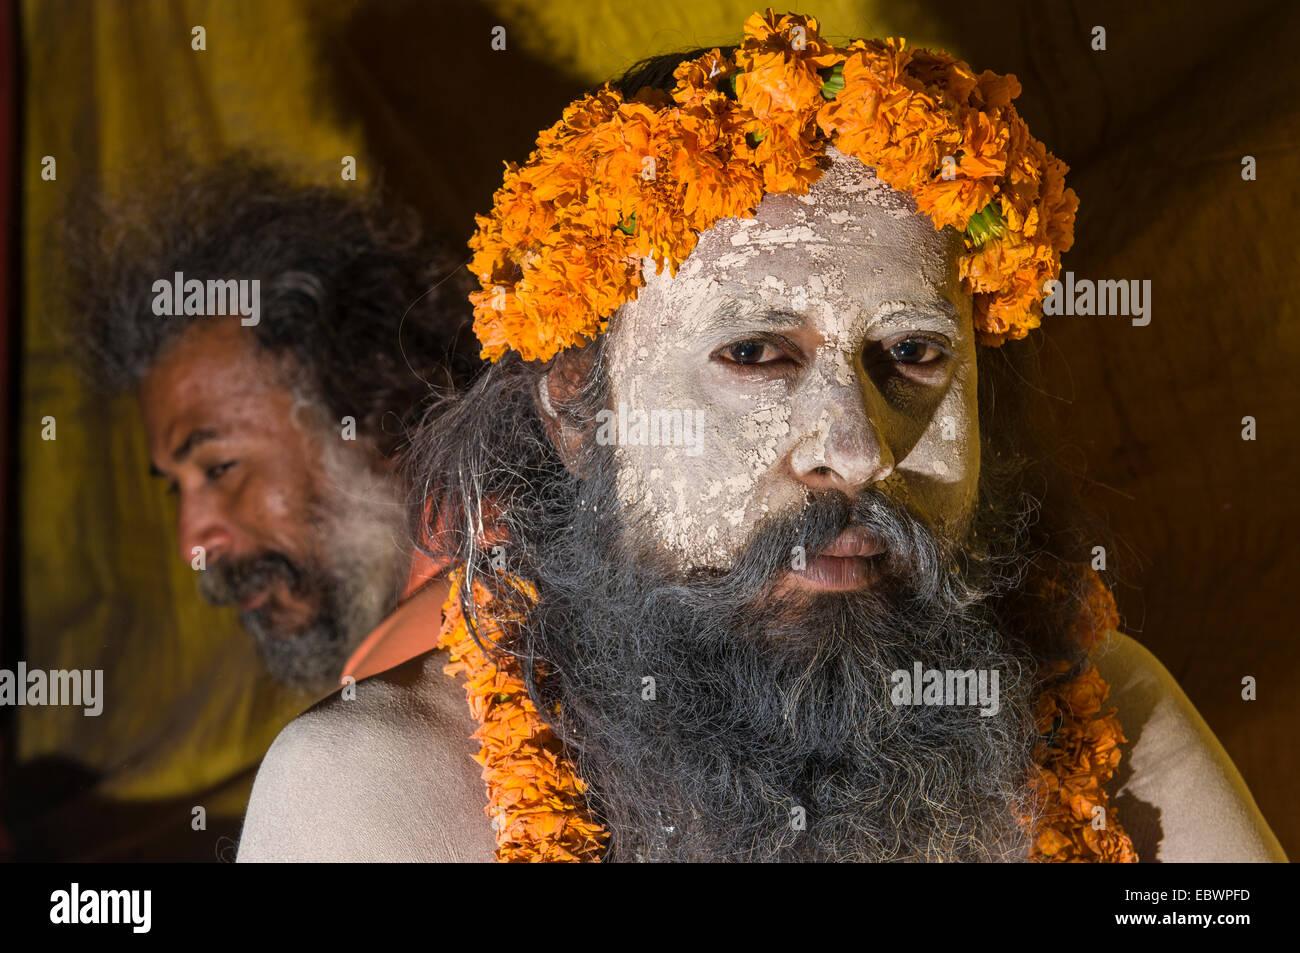 Portrait of a Shiva sadhu, holy man, at the Sangam, the confluence of the rivers Ganges, Yamuna and Saraswati - Stock Image